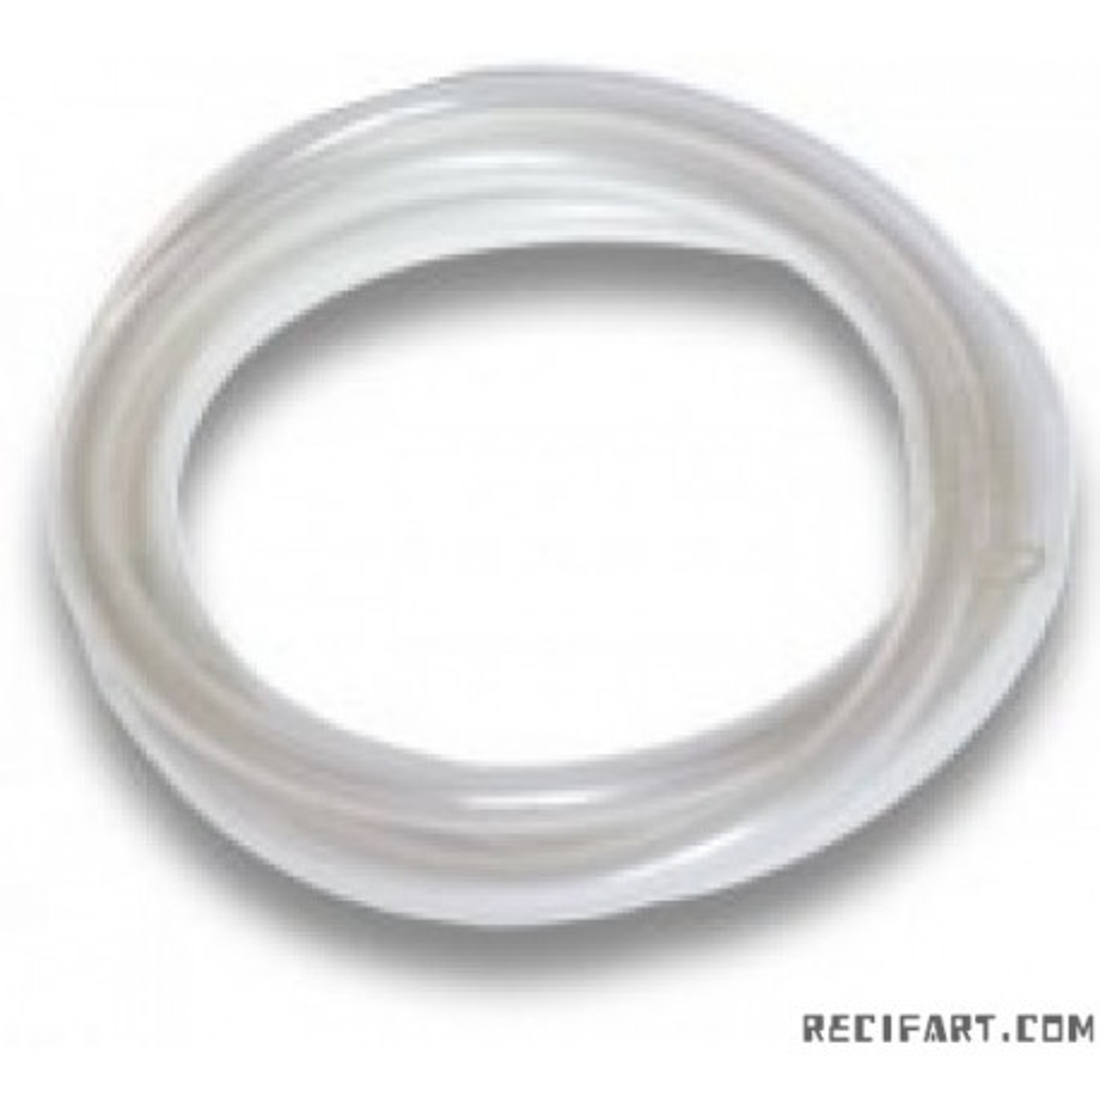 GHL Flex-PVC-Tube 6/4 1 meter